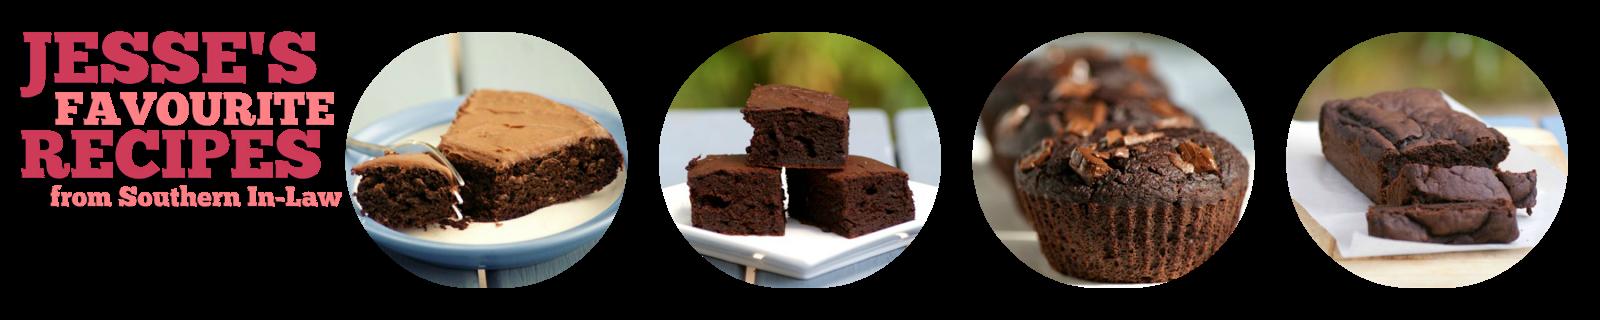 Healthy Chocolate Recipes - Gluten Free, Low Fat, Sugar Free